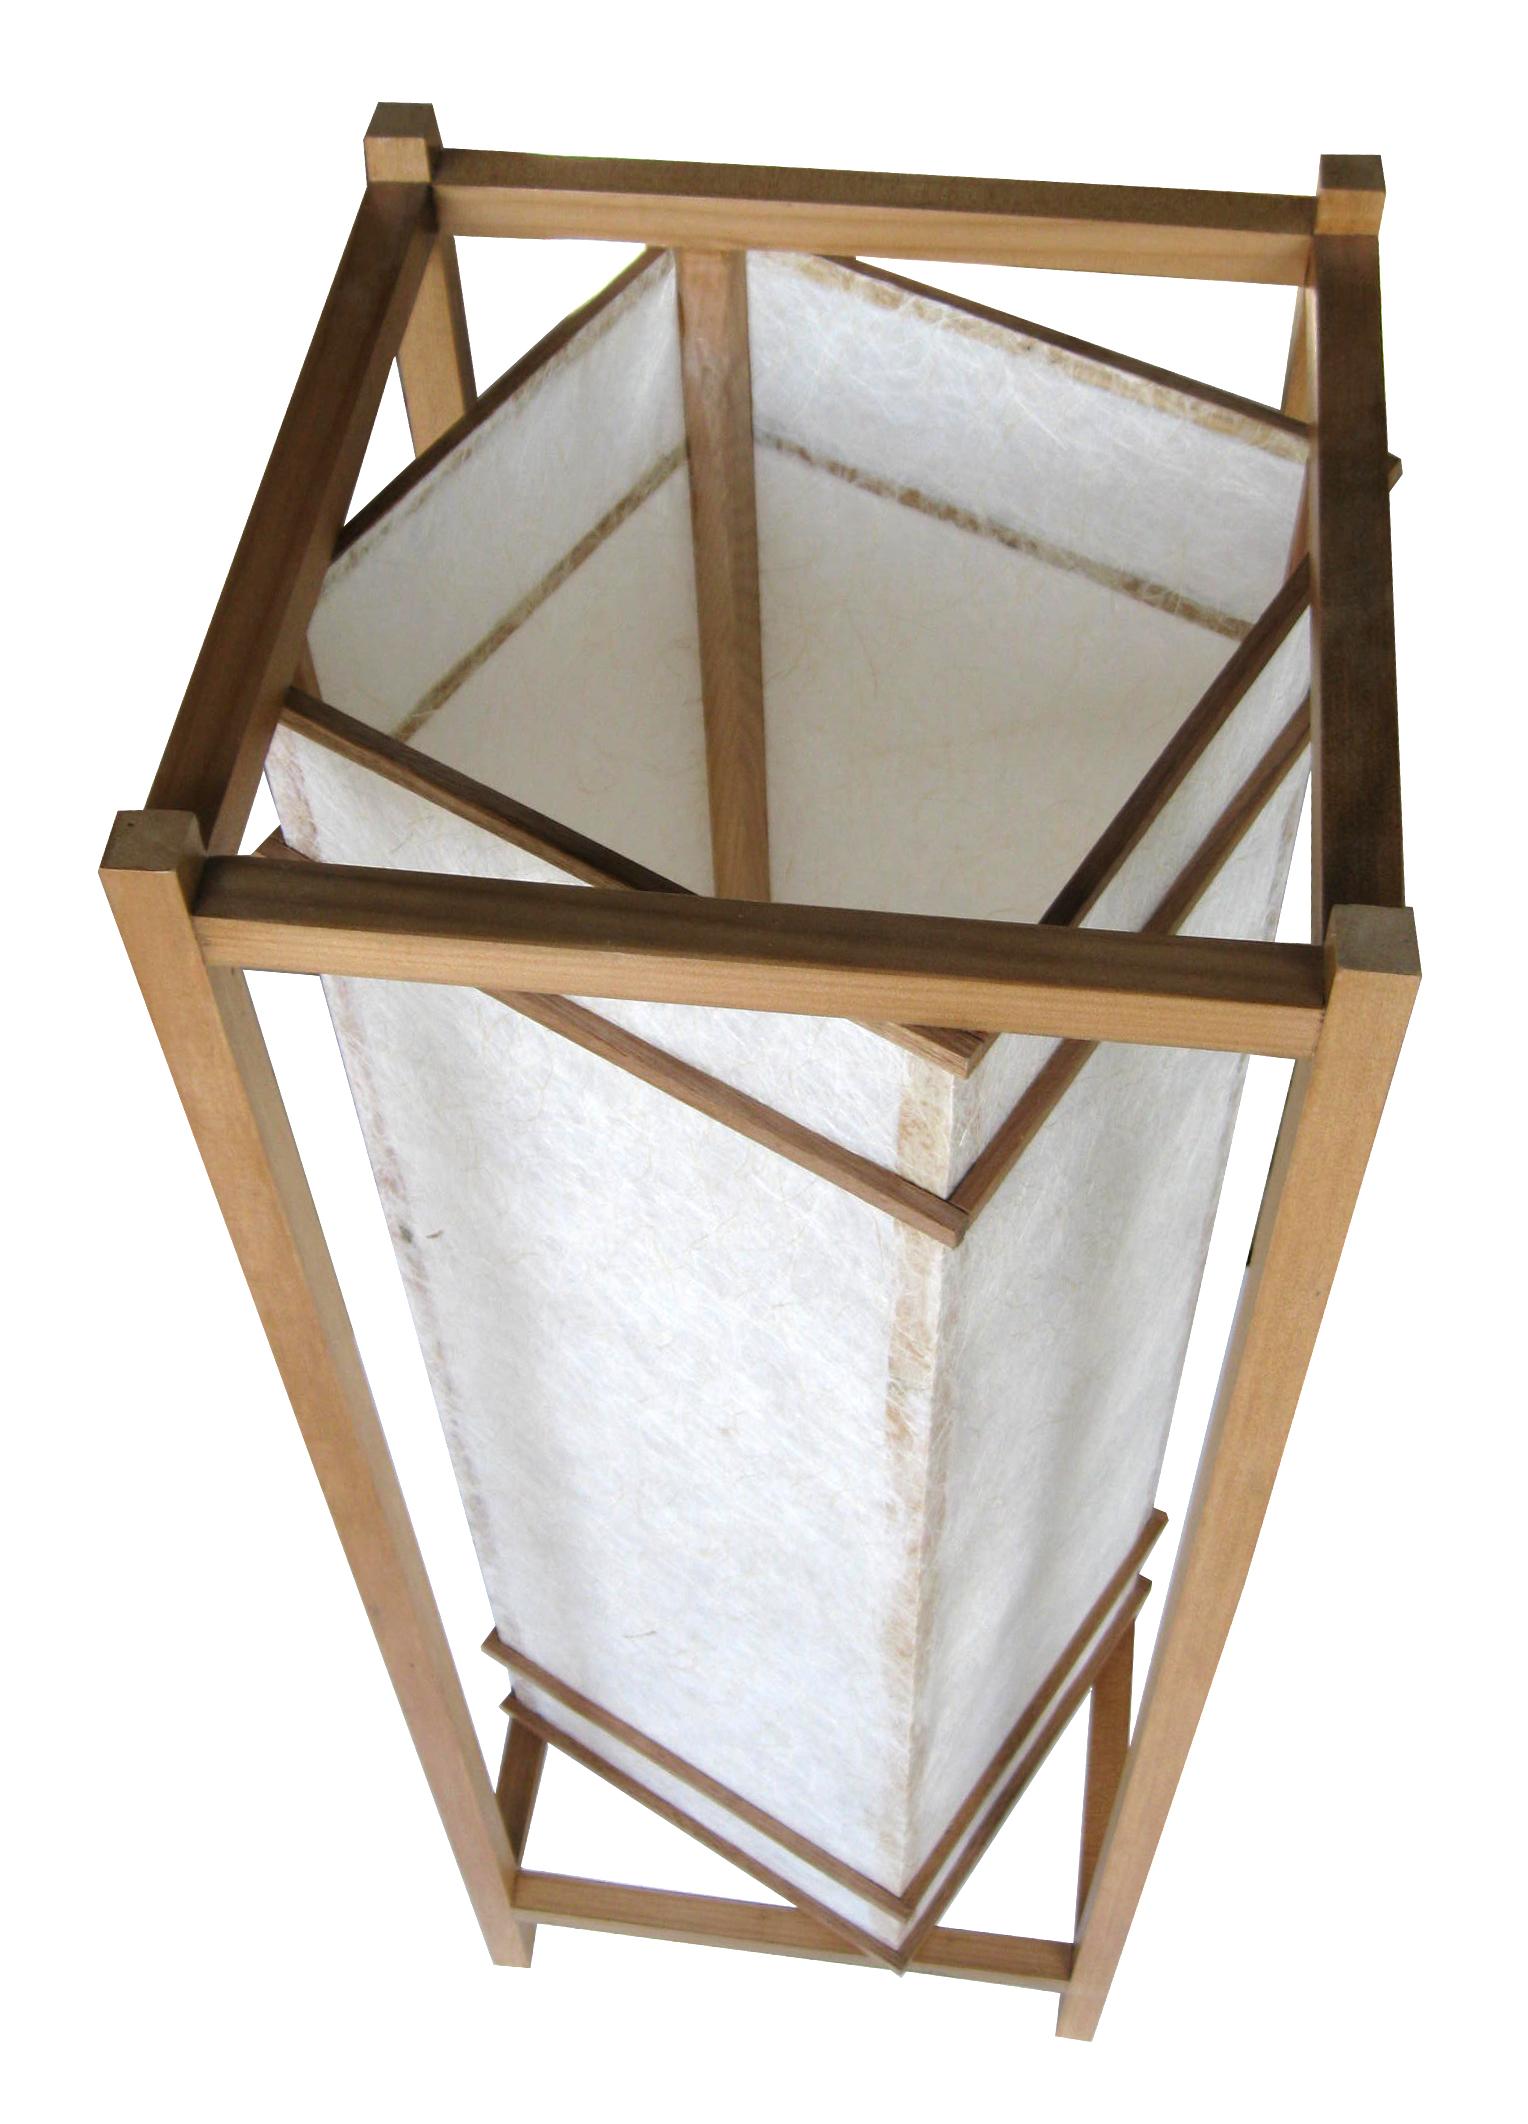 LampTwist Isometric Top.jpg